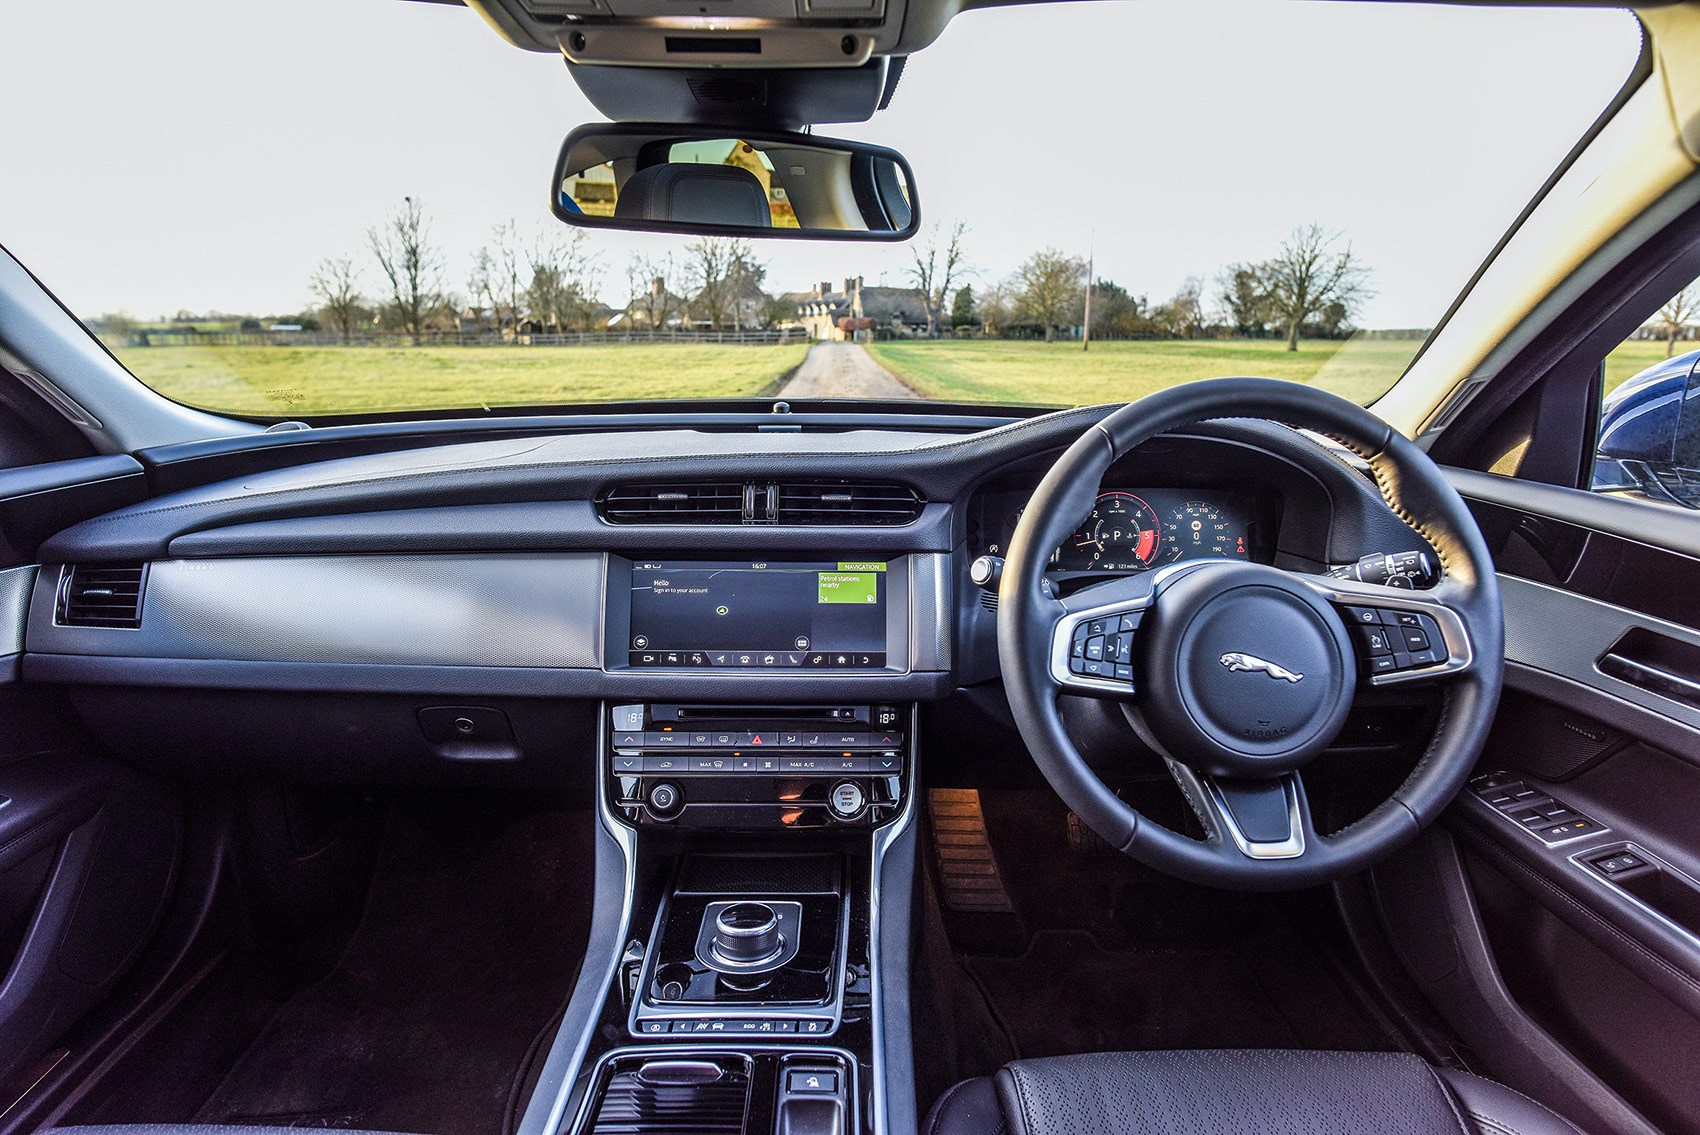 Great ... The Interior Of Our New 2018 Jaguar XF Sportbrake Estate